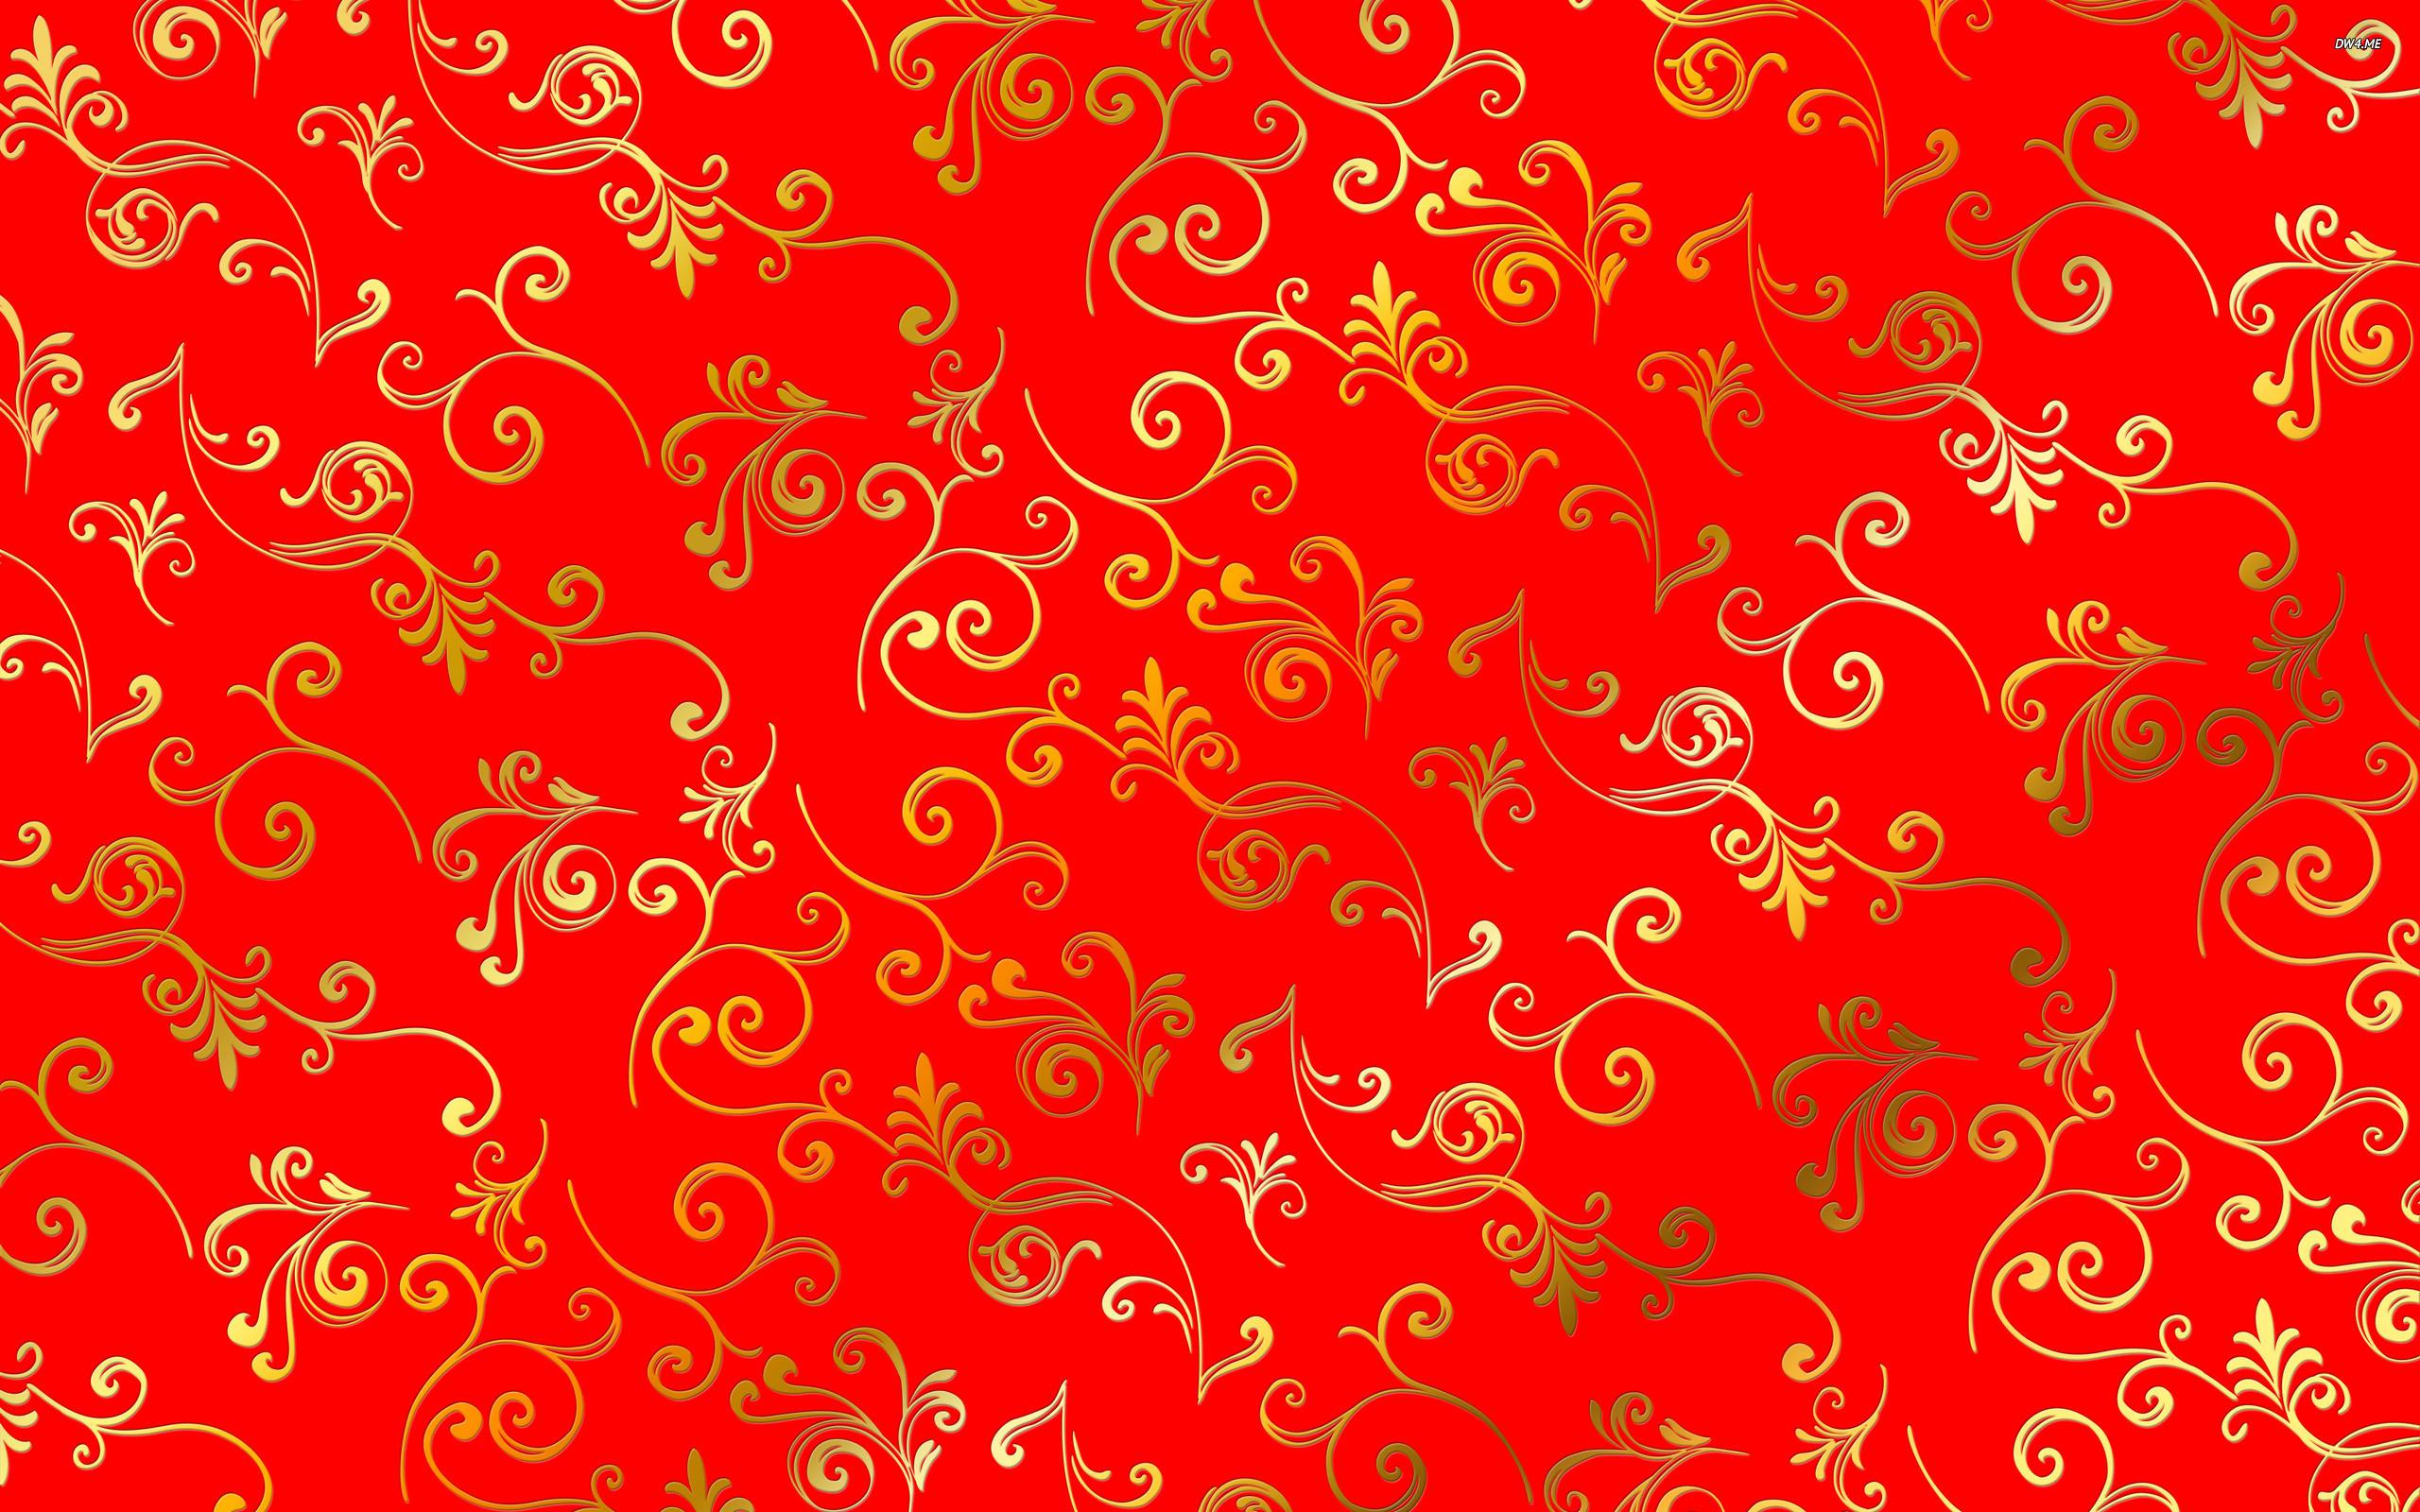 Golden swirl pattern Vector desktop wallpaper, Gold wallpaper, Swirl  wallpaper, Patter wallpaper, Floral wallpaper – Vector no. 975